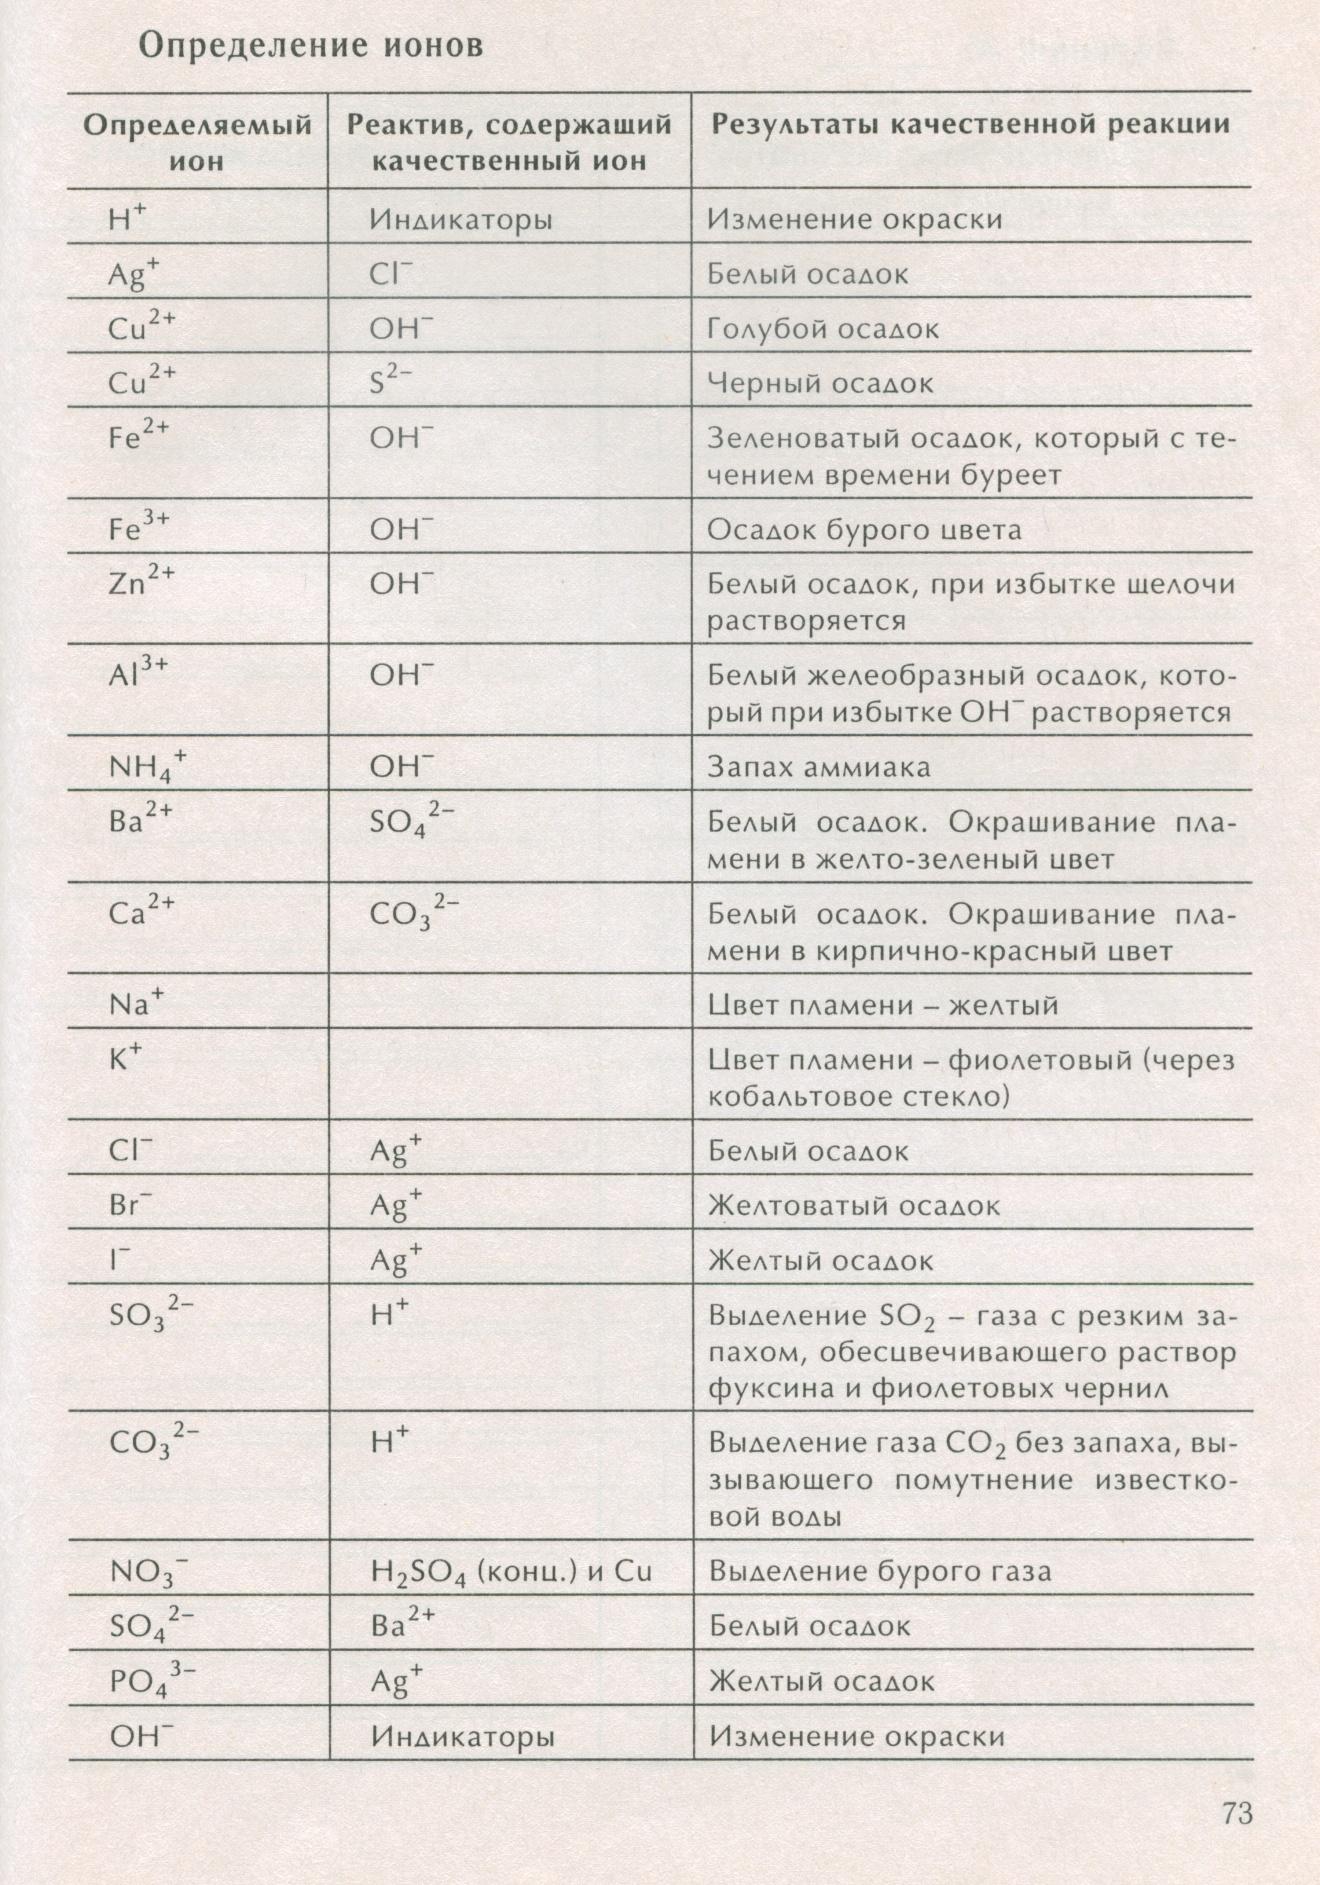 Лабиринт23.bmp